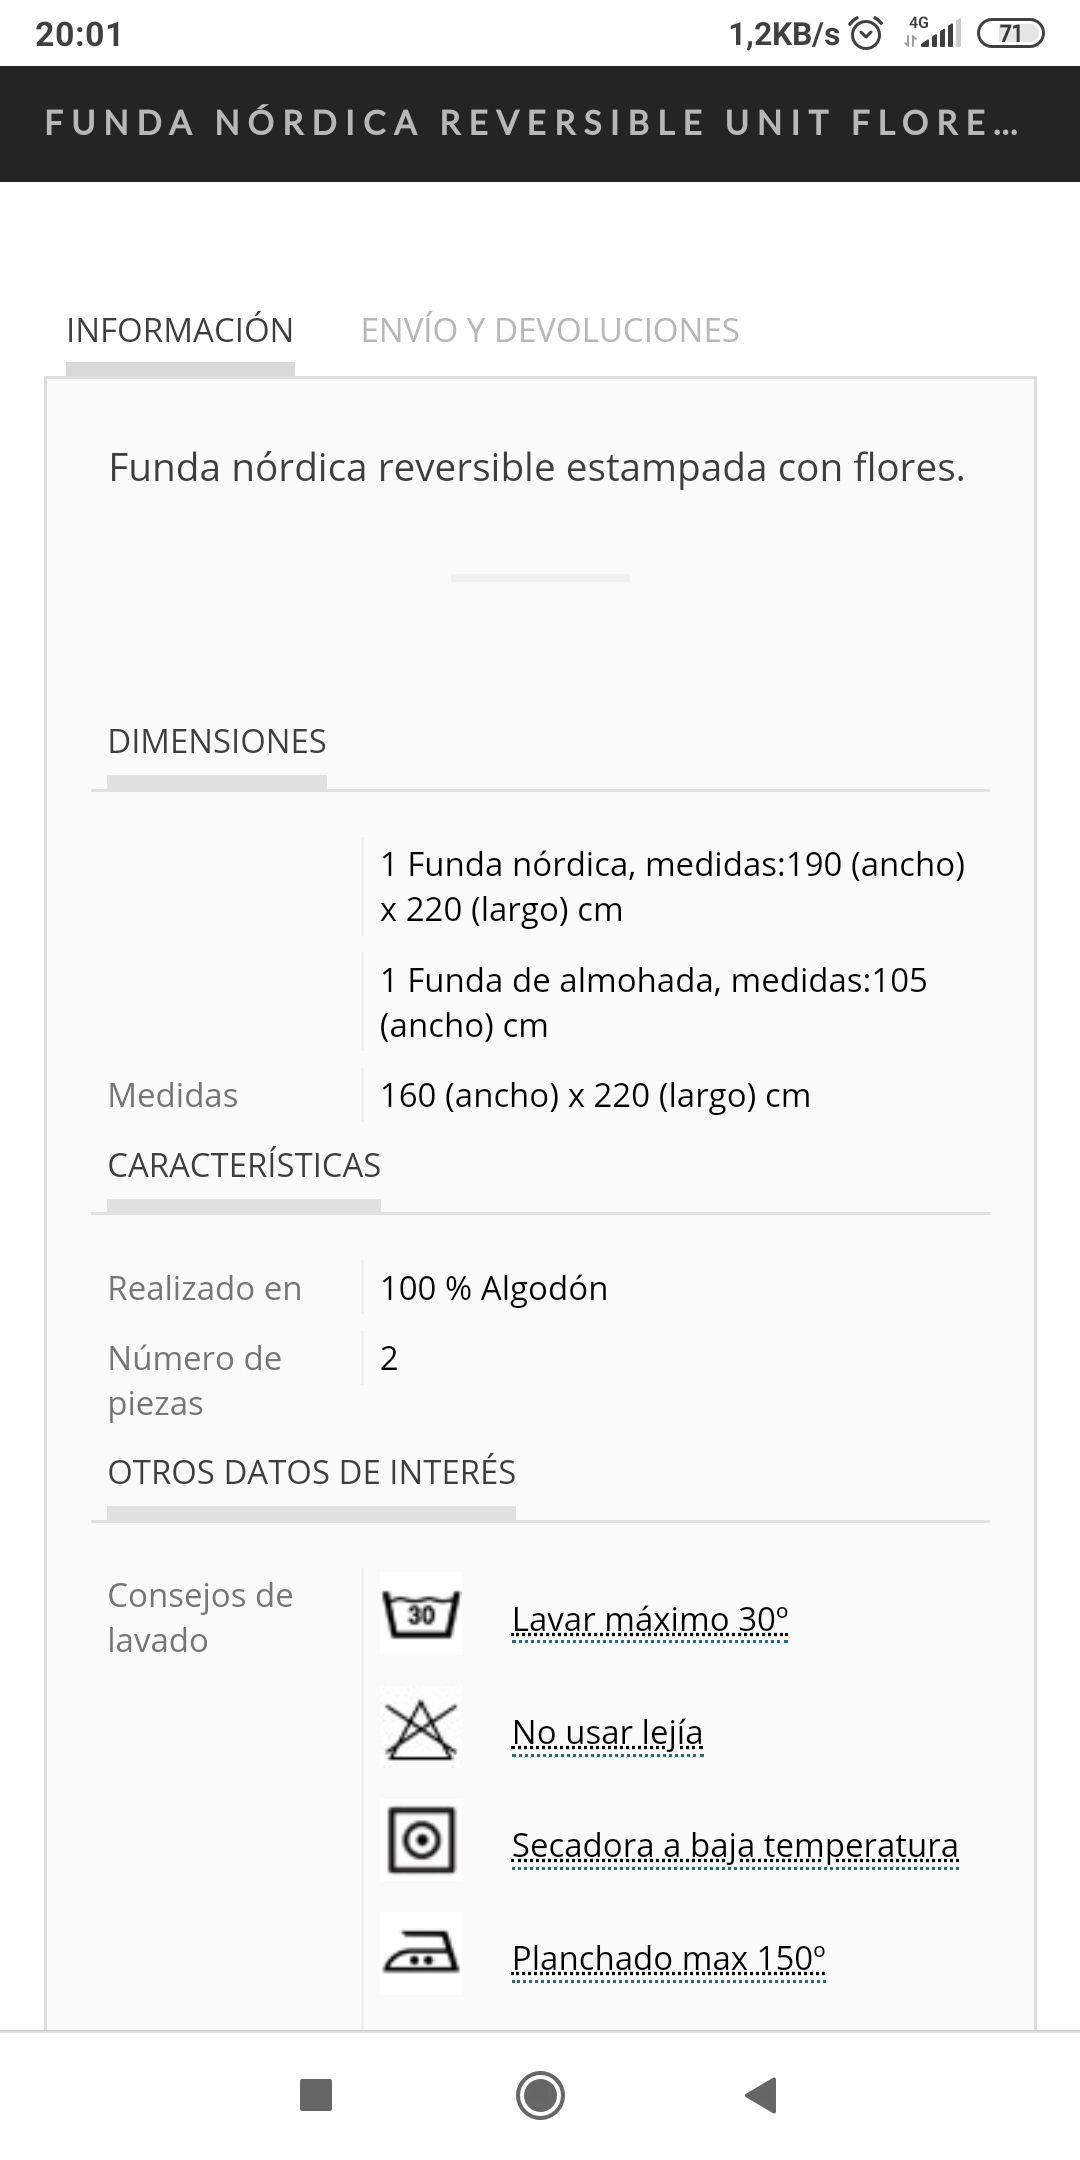 2598773-W2Fz7.jpg